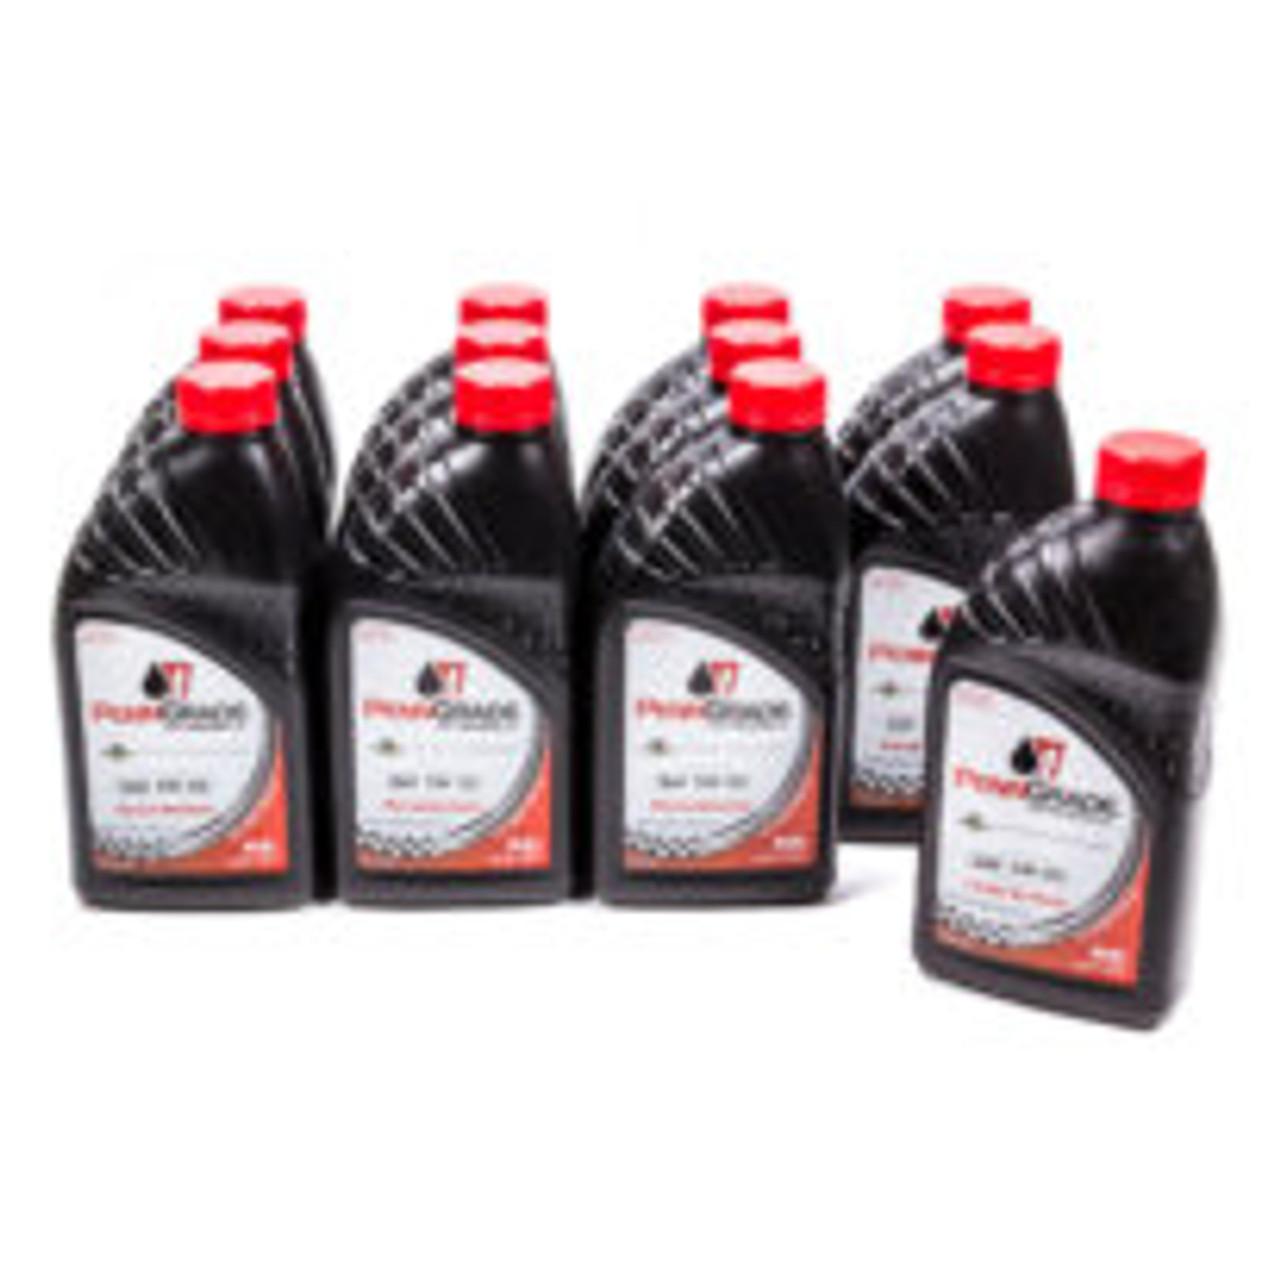 BPO71096-12, 5W30 RACING OIL CS/12-QTPARTIAL SYNTHETIC